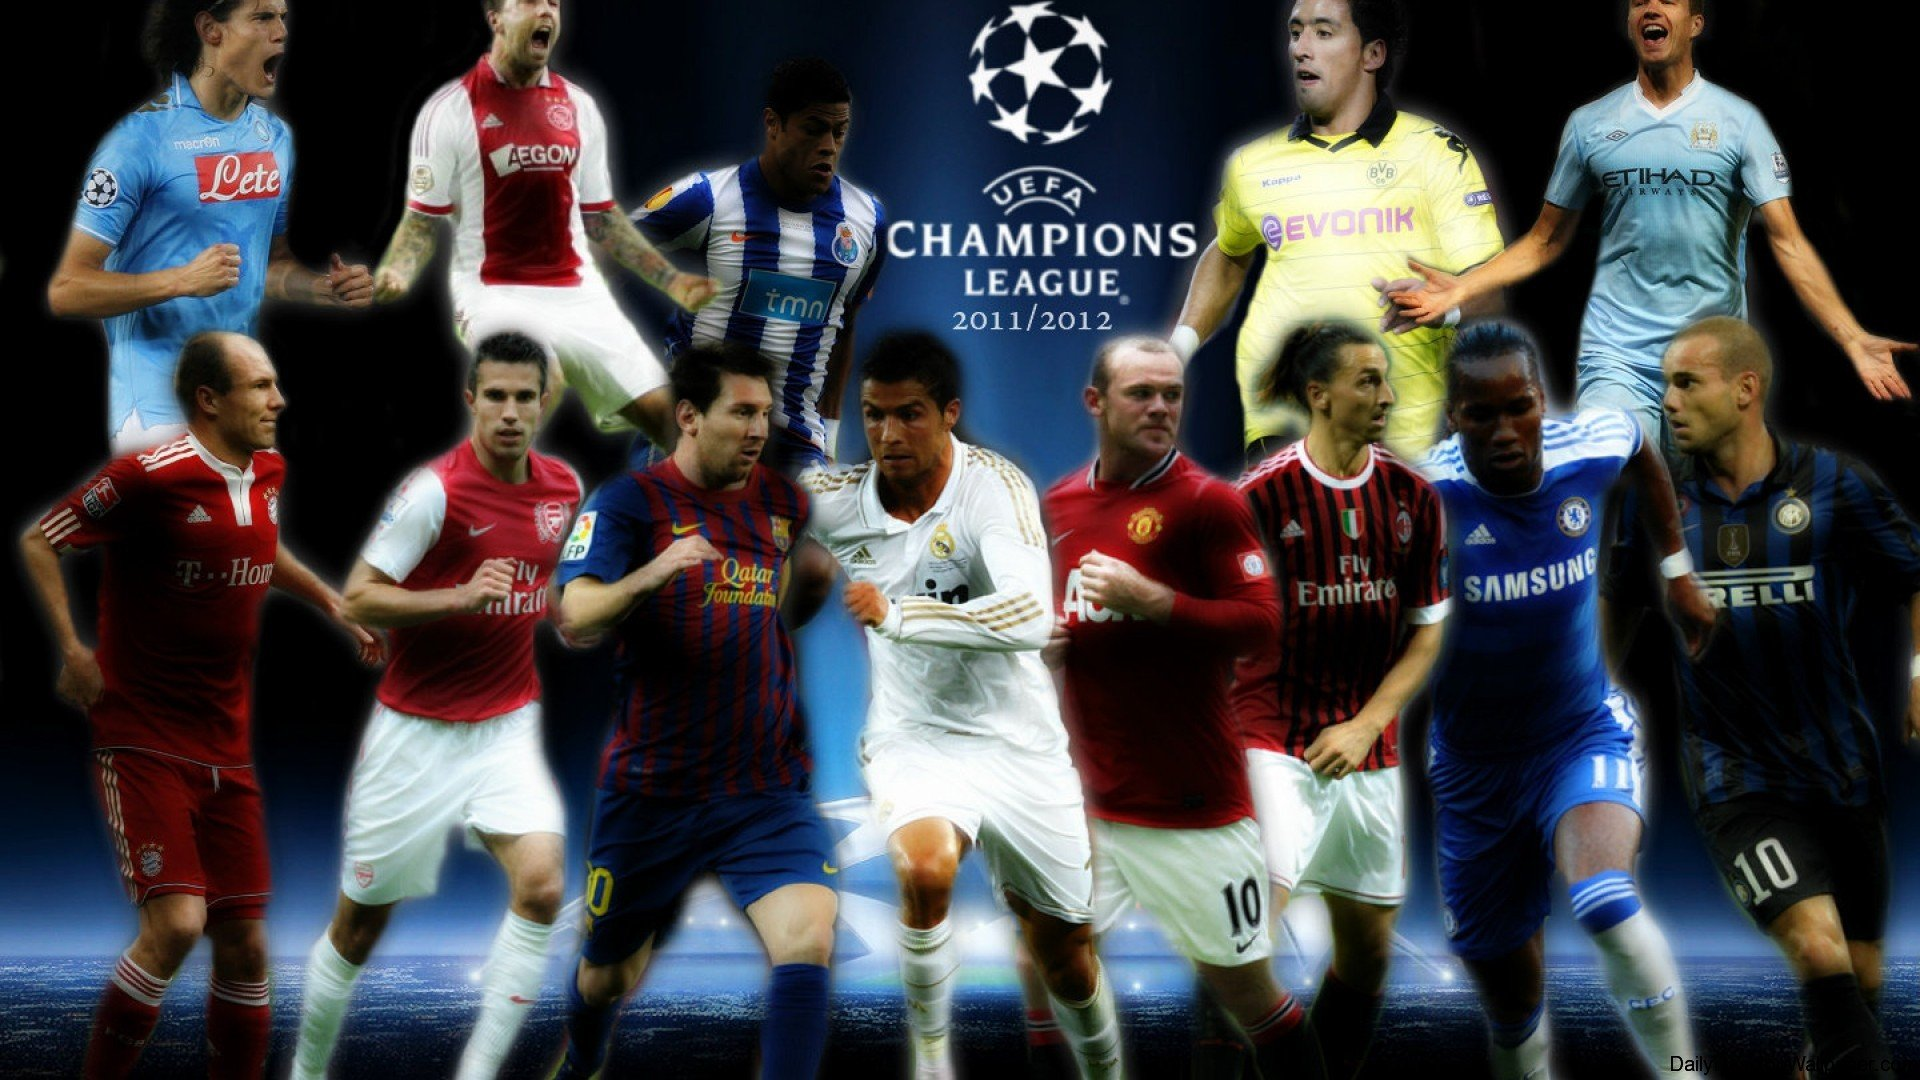 Champions League Wallpaper   HD Wallpapers 1920x1080